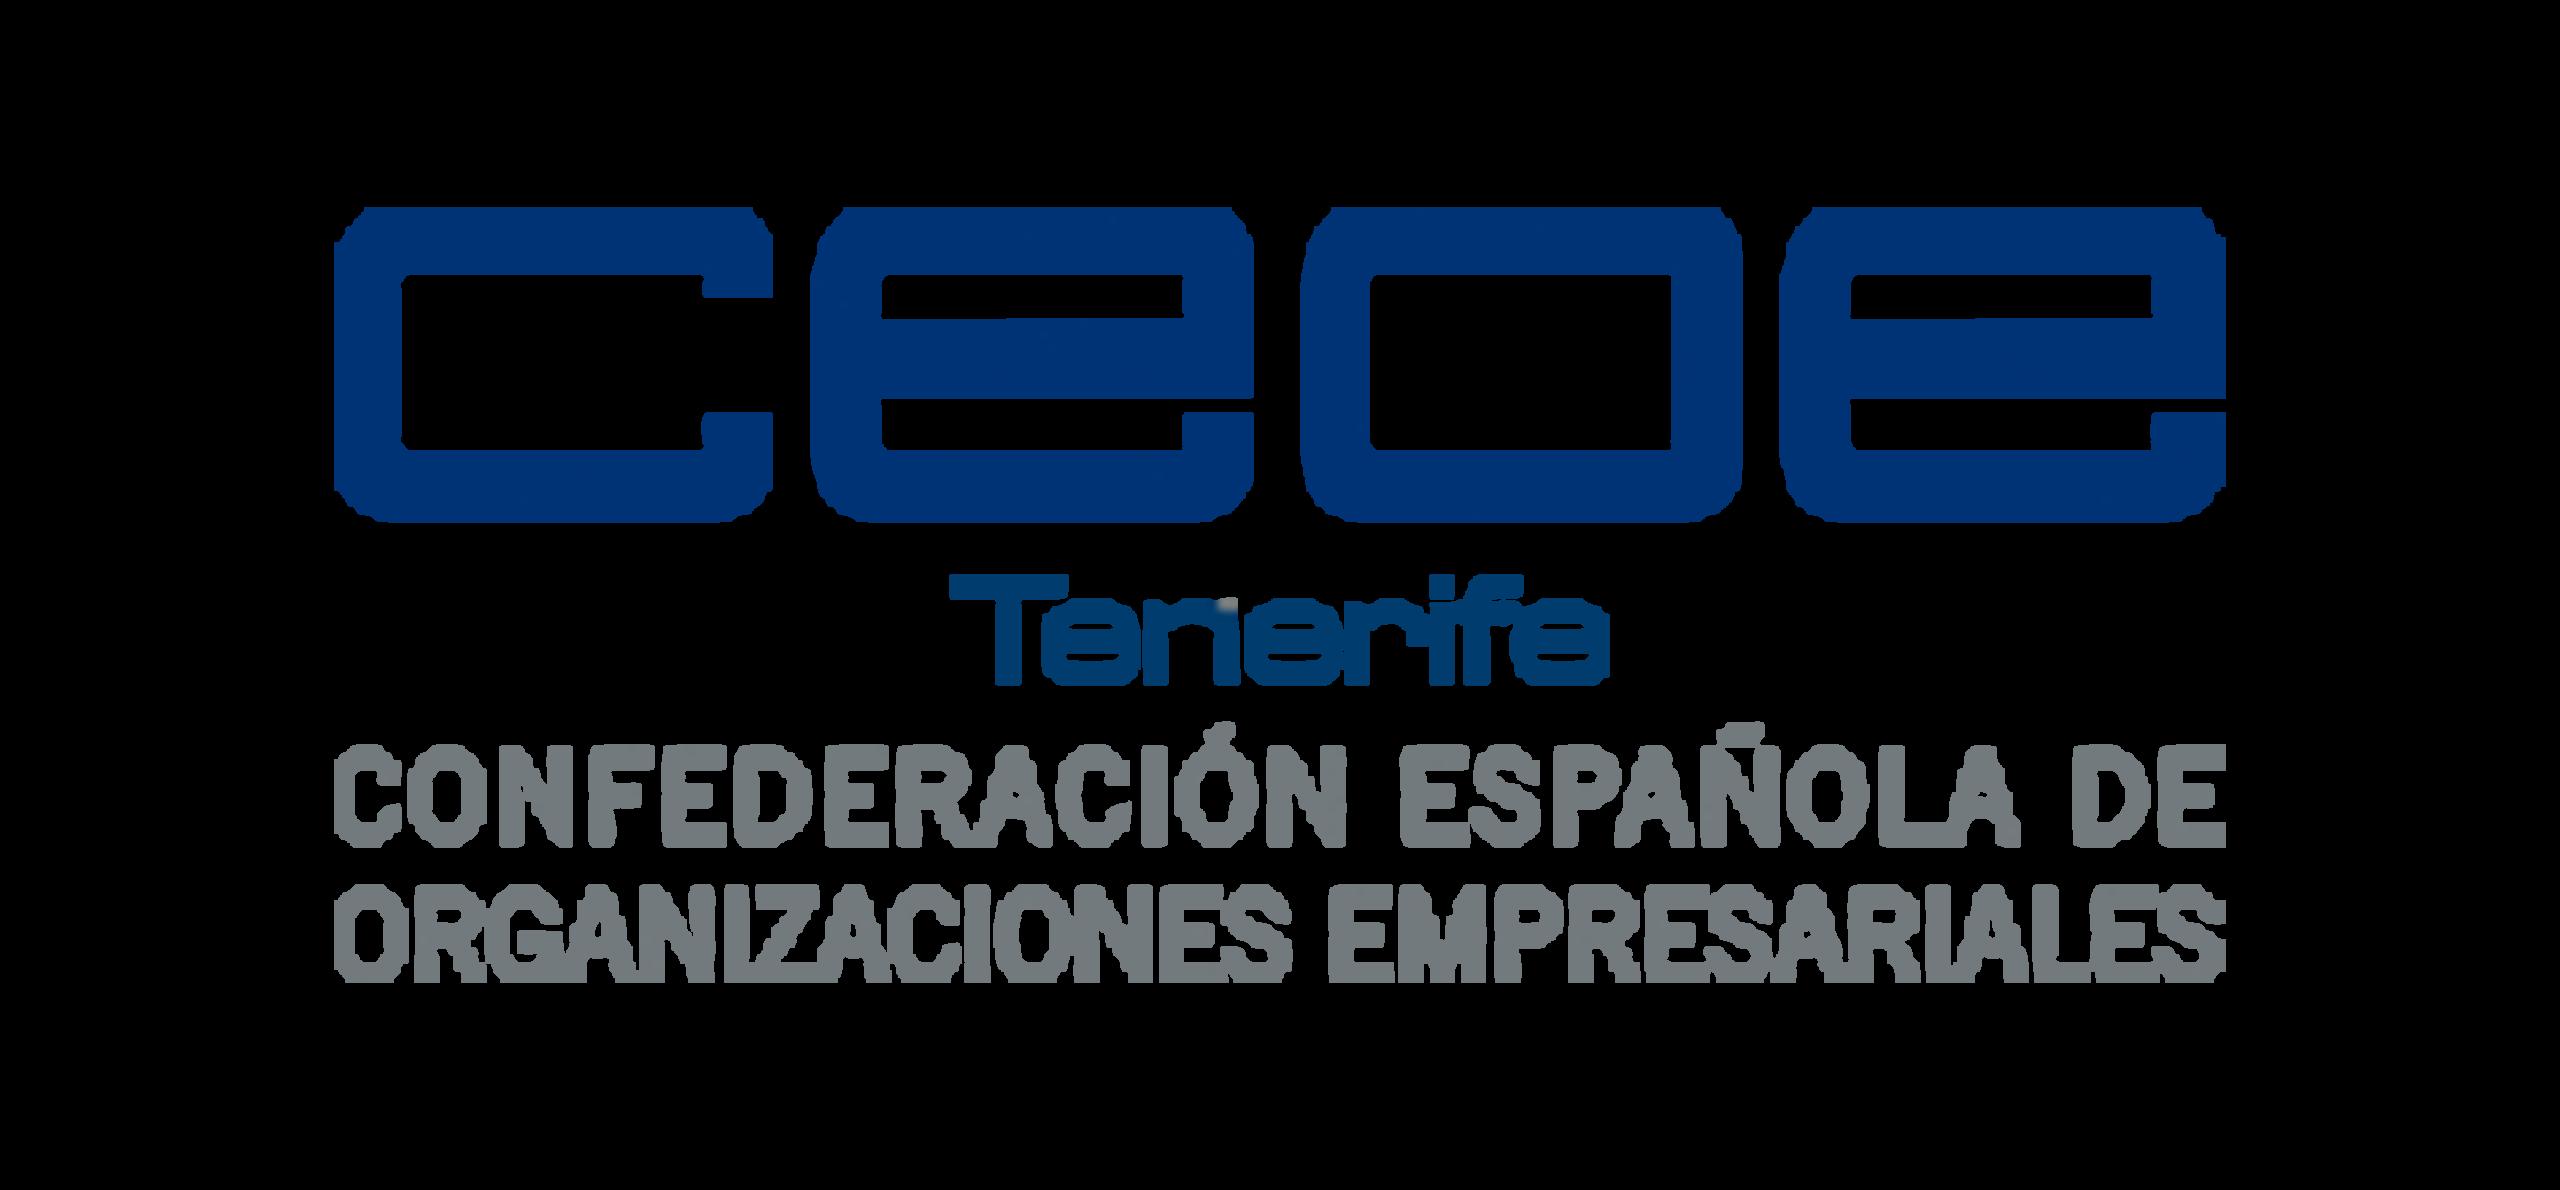 CEOE AZUL - Portfolio